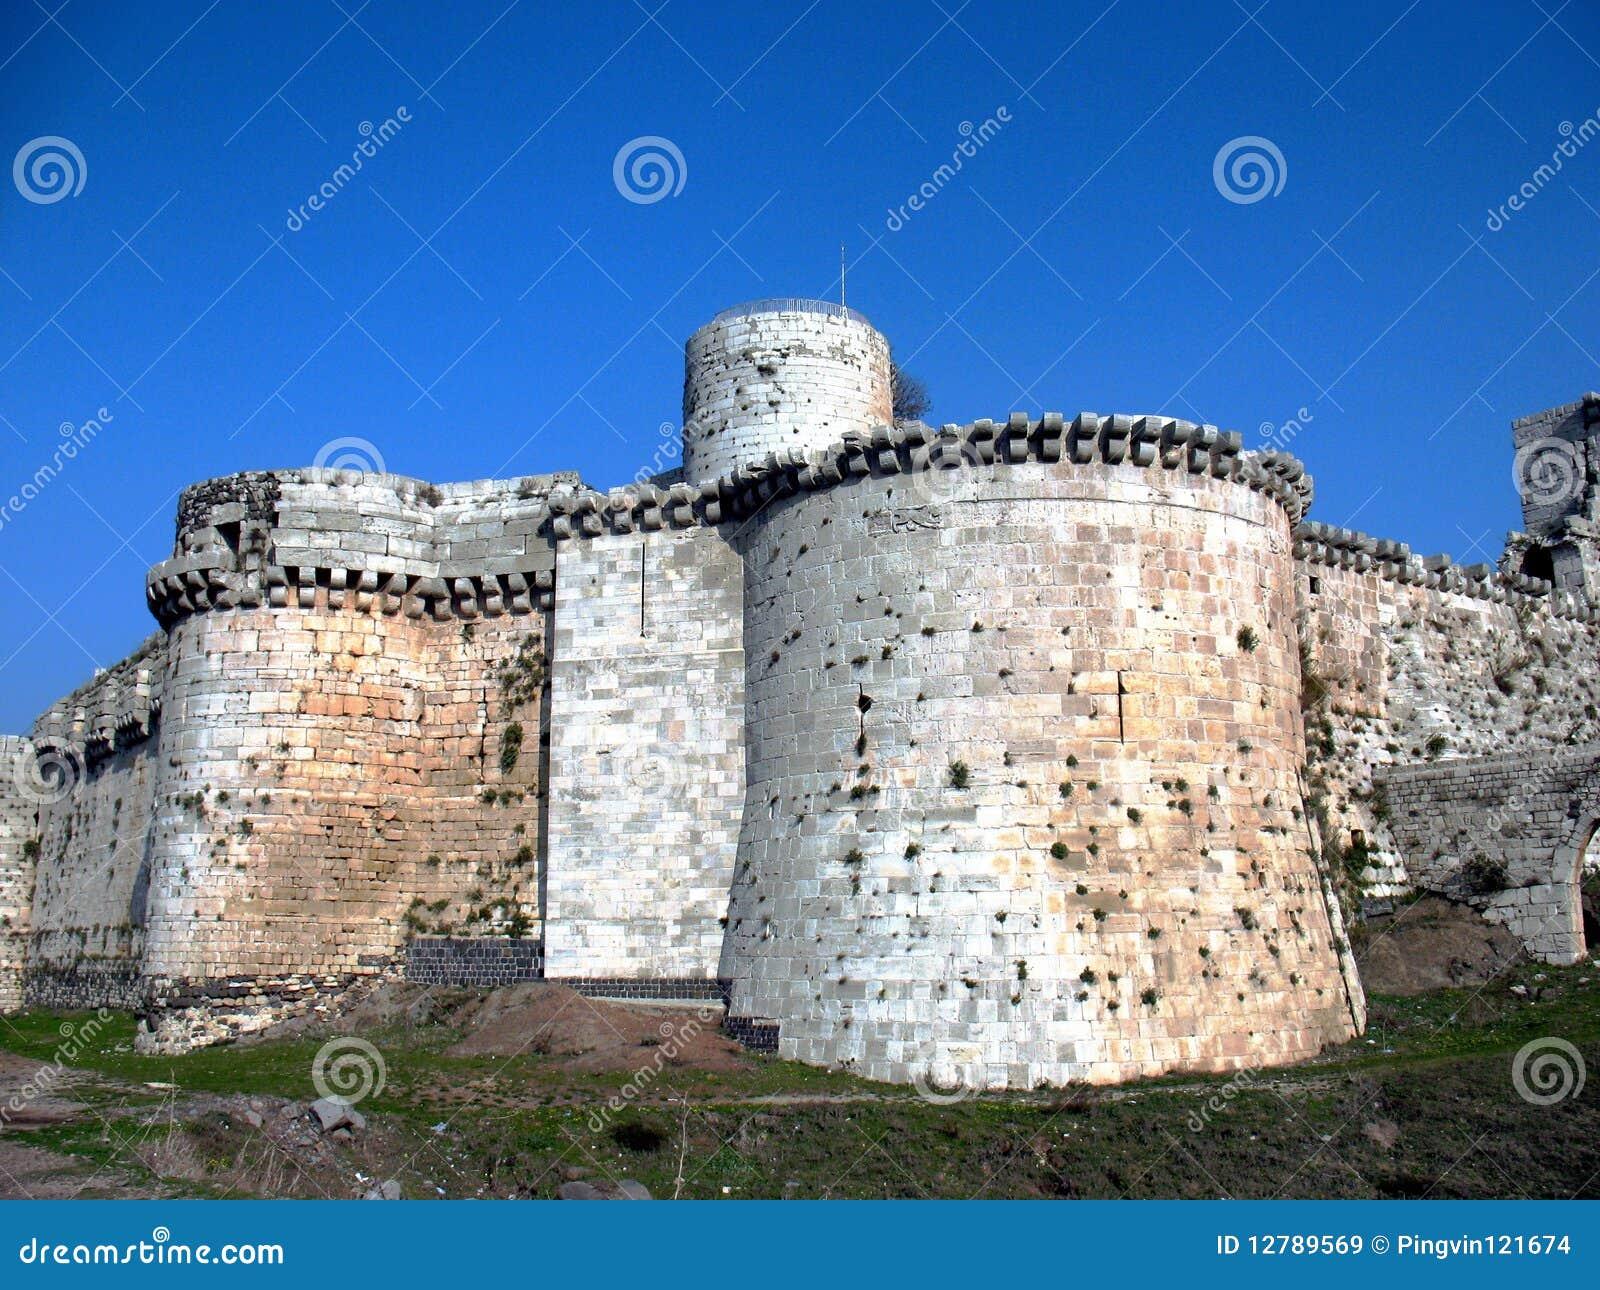 Сrak des Chevaliers. Western Wall